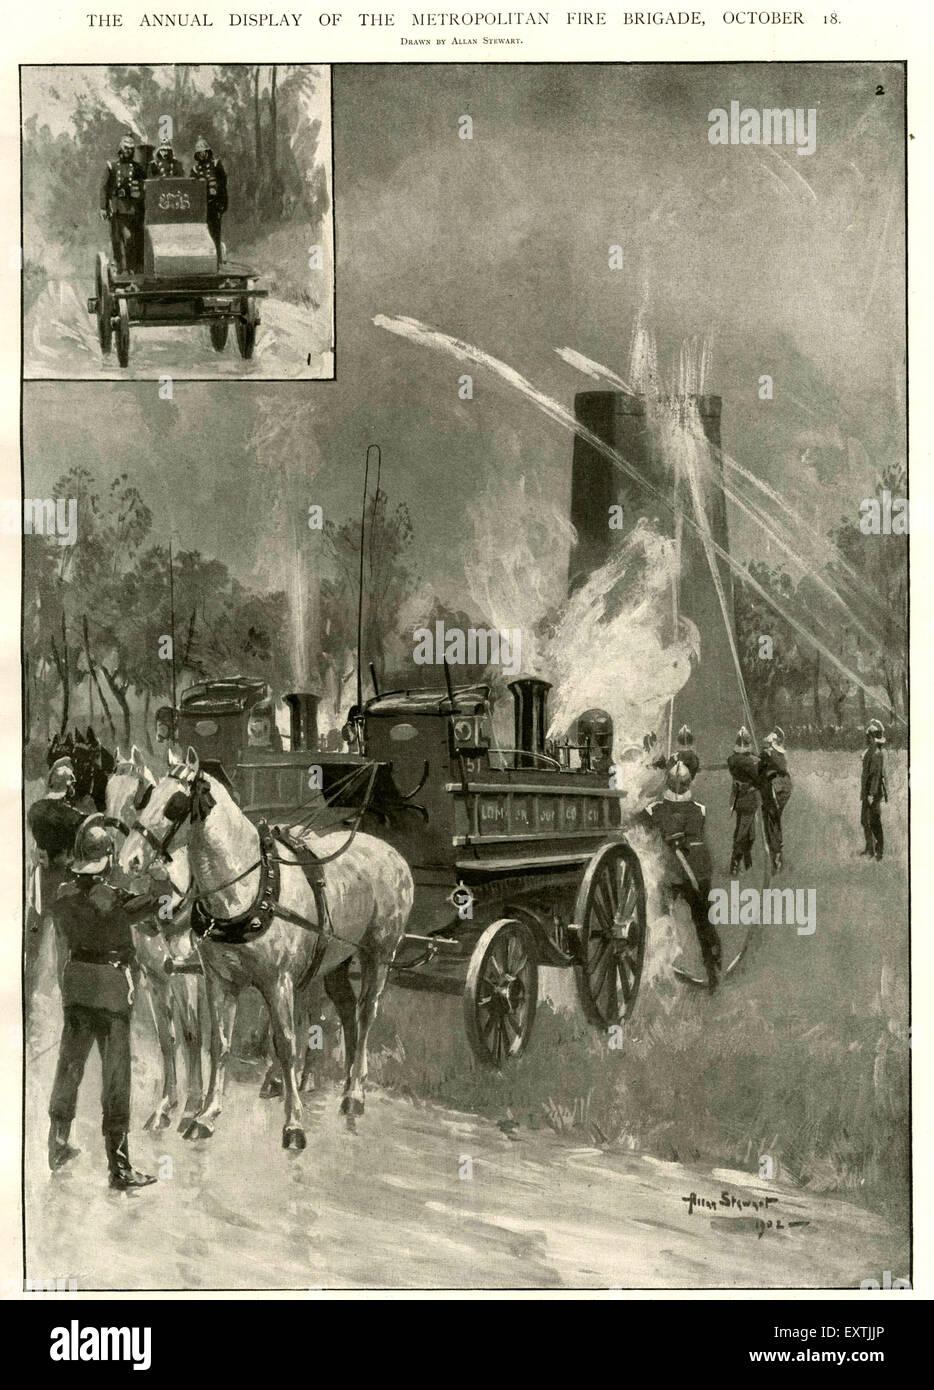 1900s UK Metropolitan Fire Brigade Magazine Plate - Stock Image